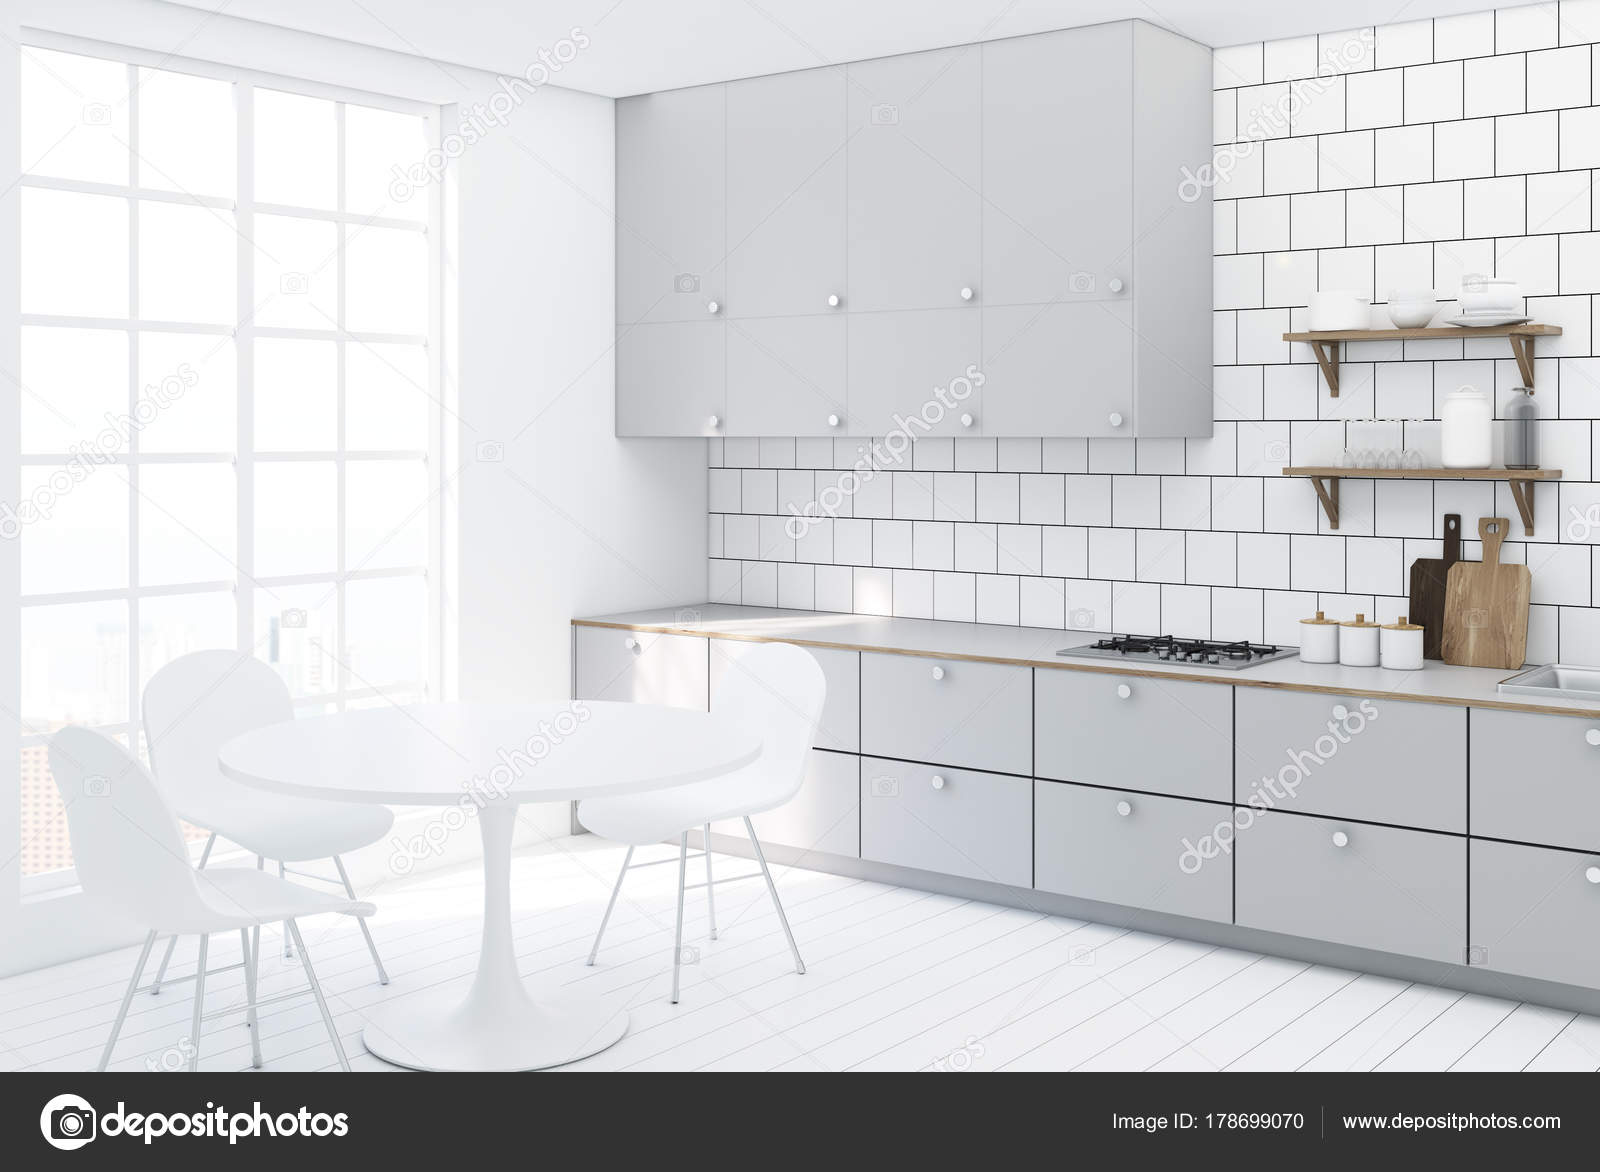 Piastrelle Bianche Piastrelle Bianche Cucina Elegante Awesome Stock Piastrelle Cucina Home